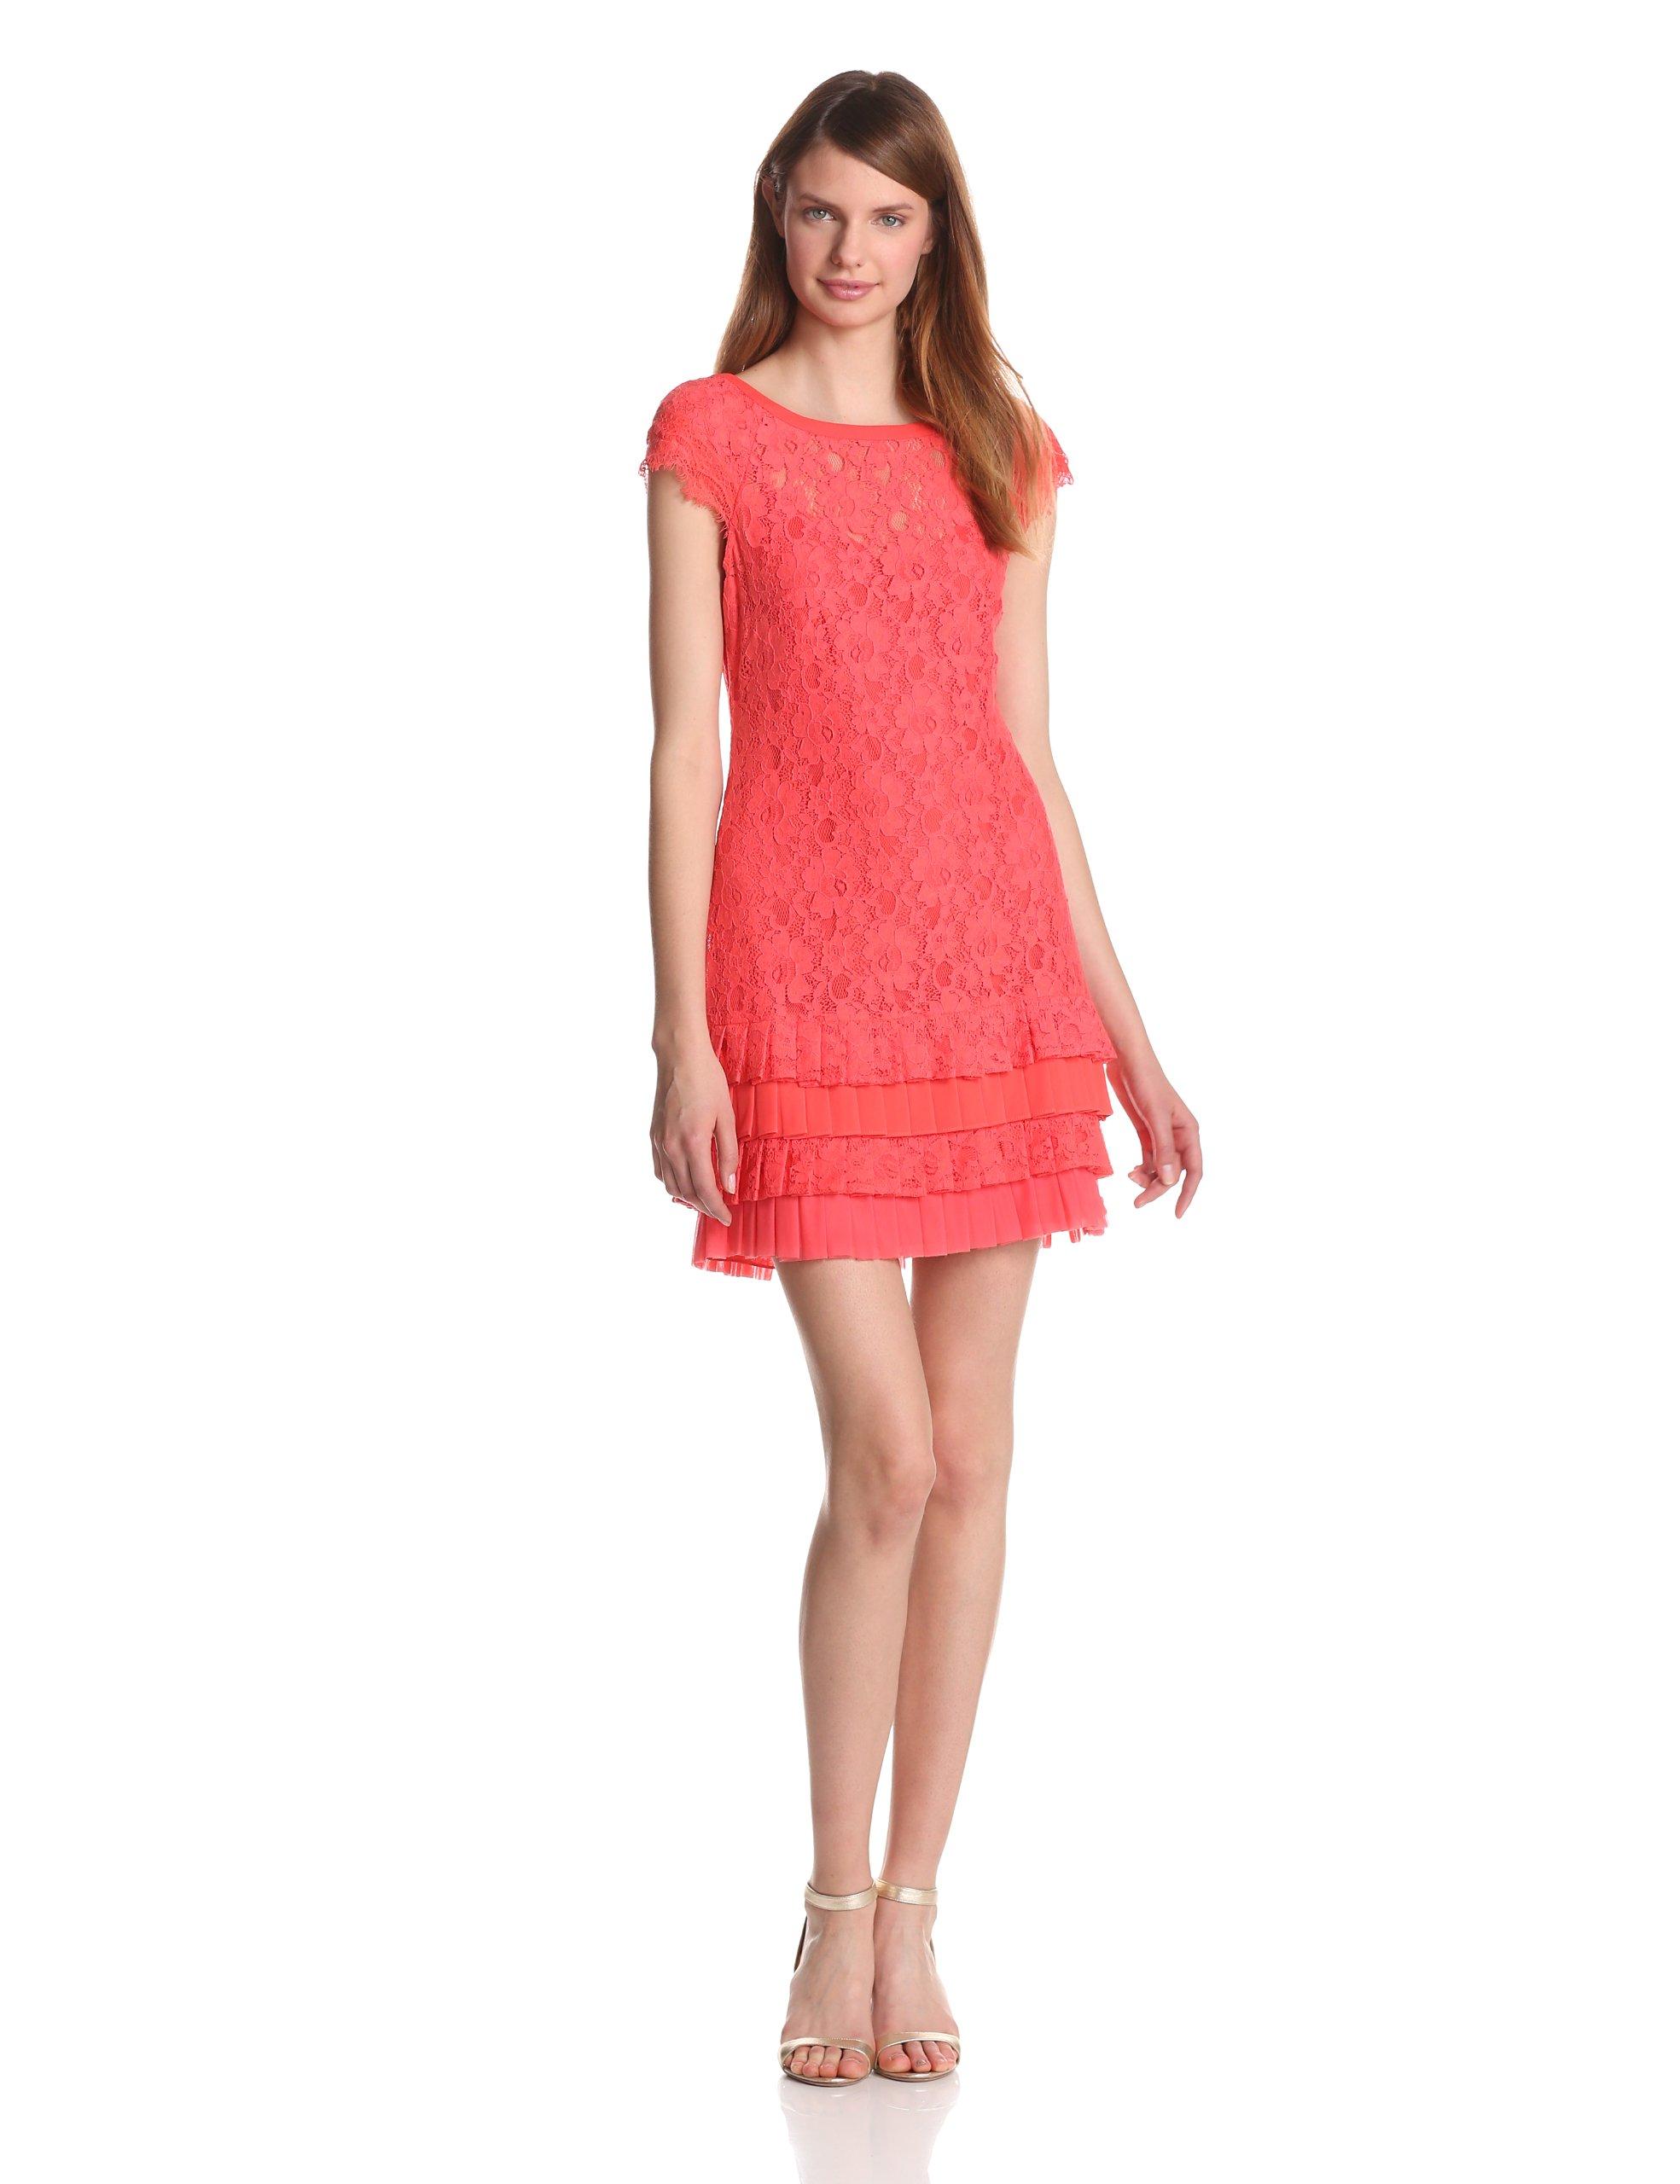 Jessica Simpson Women's Drop Waist Lace Overlay Dress, Hot Coral, 4